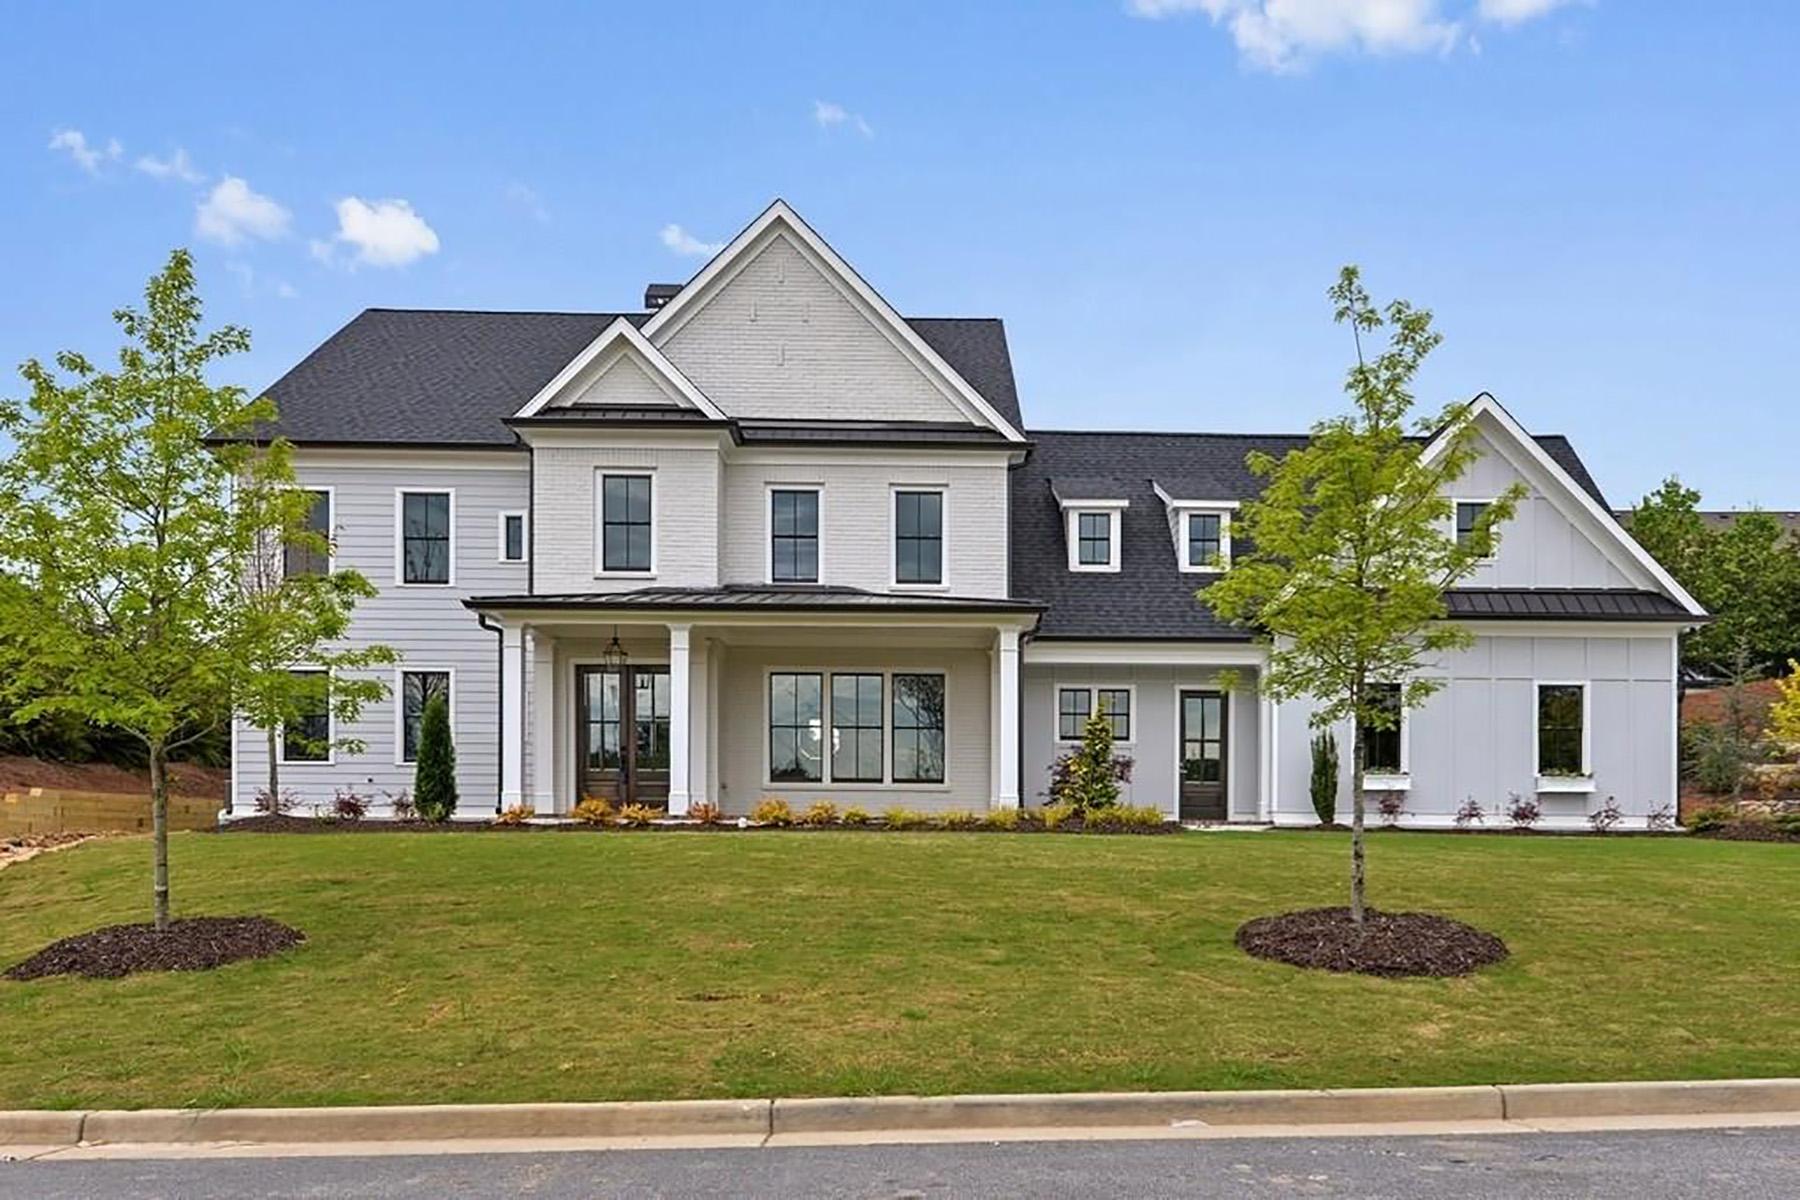 Single Family Home for Sale at Welcome to Birch Grove in Marietta 2173 Bliss Lane Marietta, Georgia 30006 United States